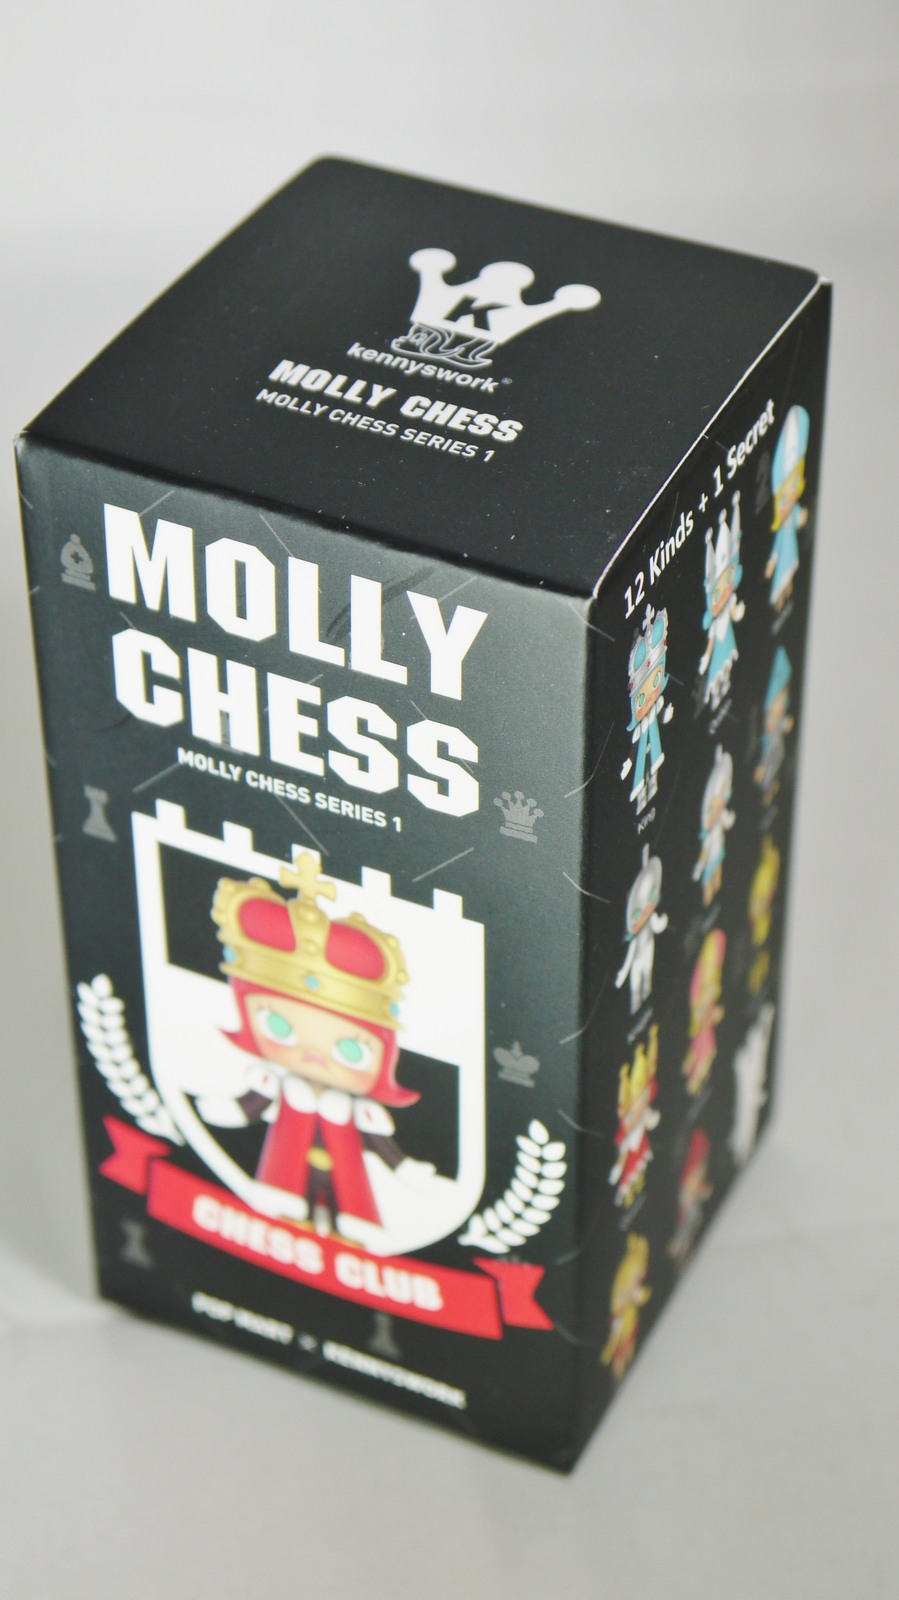 POP MART Kennyswork BLOCK Little Molly Chess Club Chessmate BISHOP PINK